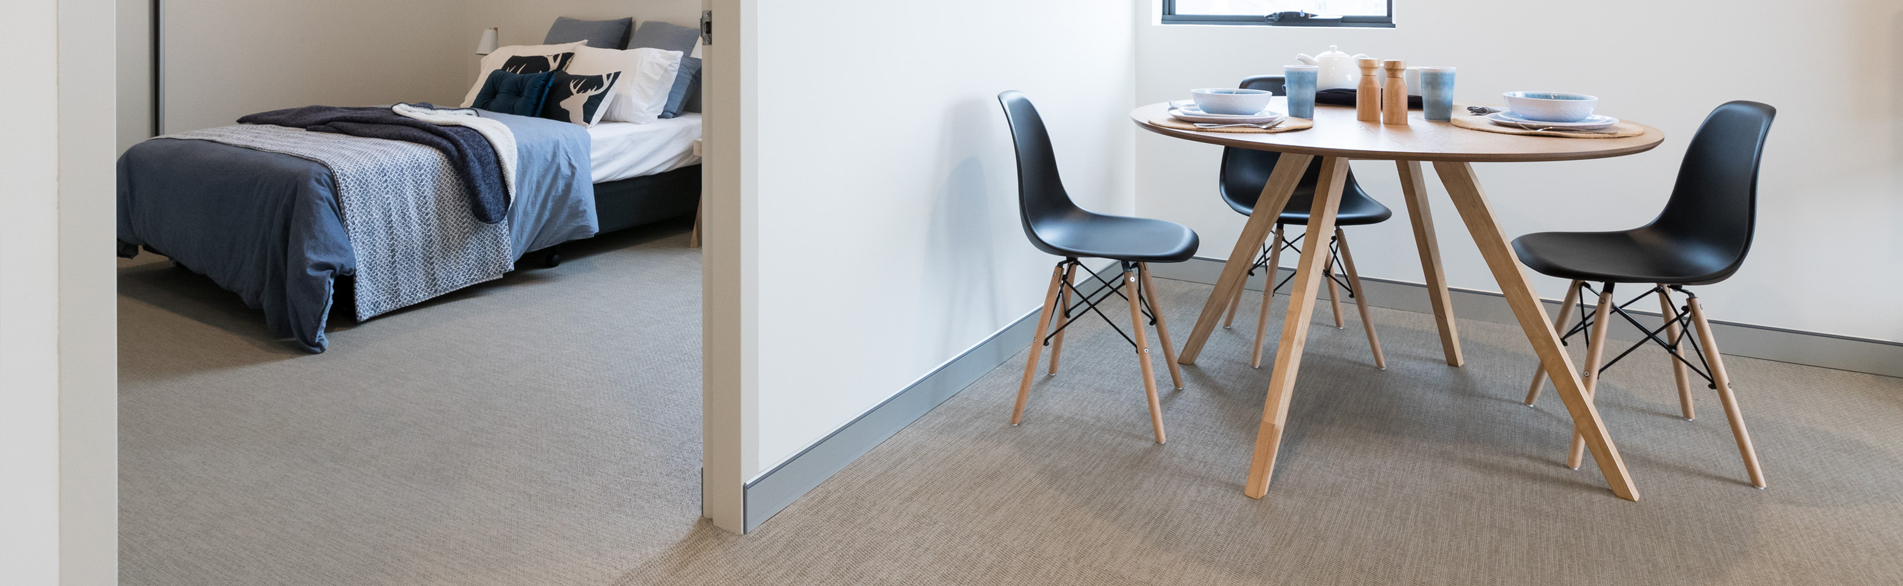 Guildford Disability Housing, Australia - Gallyer (3)